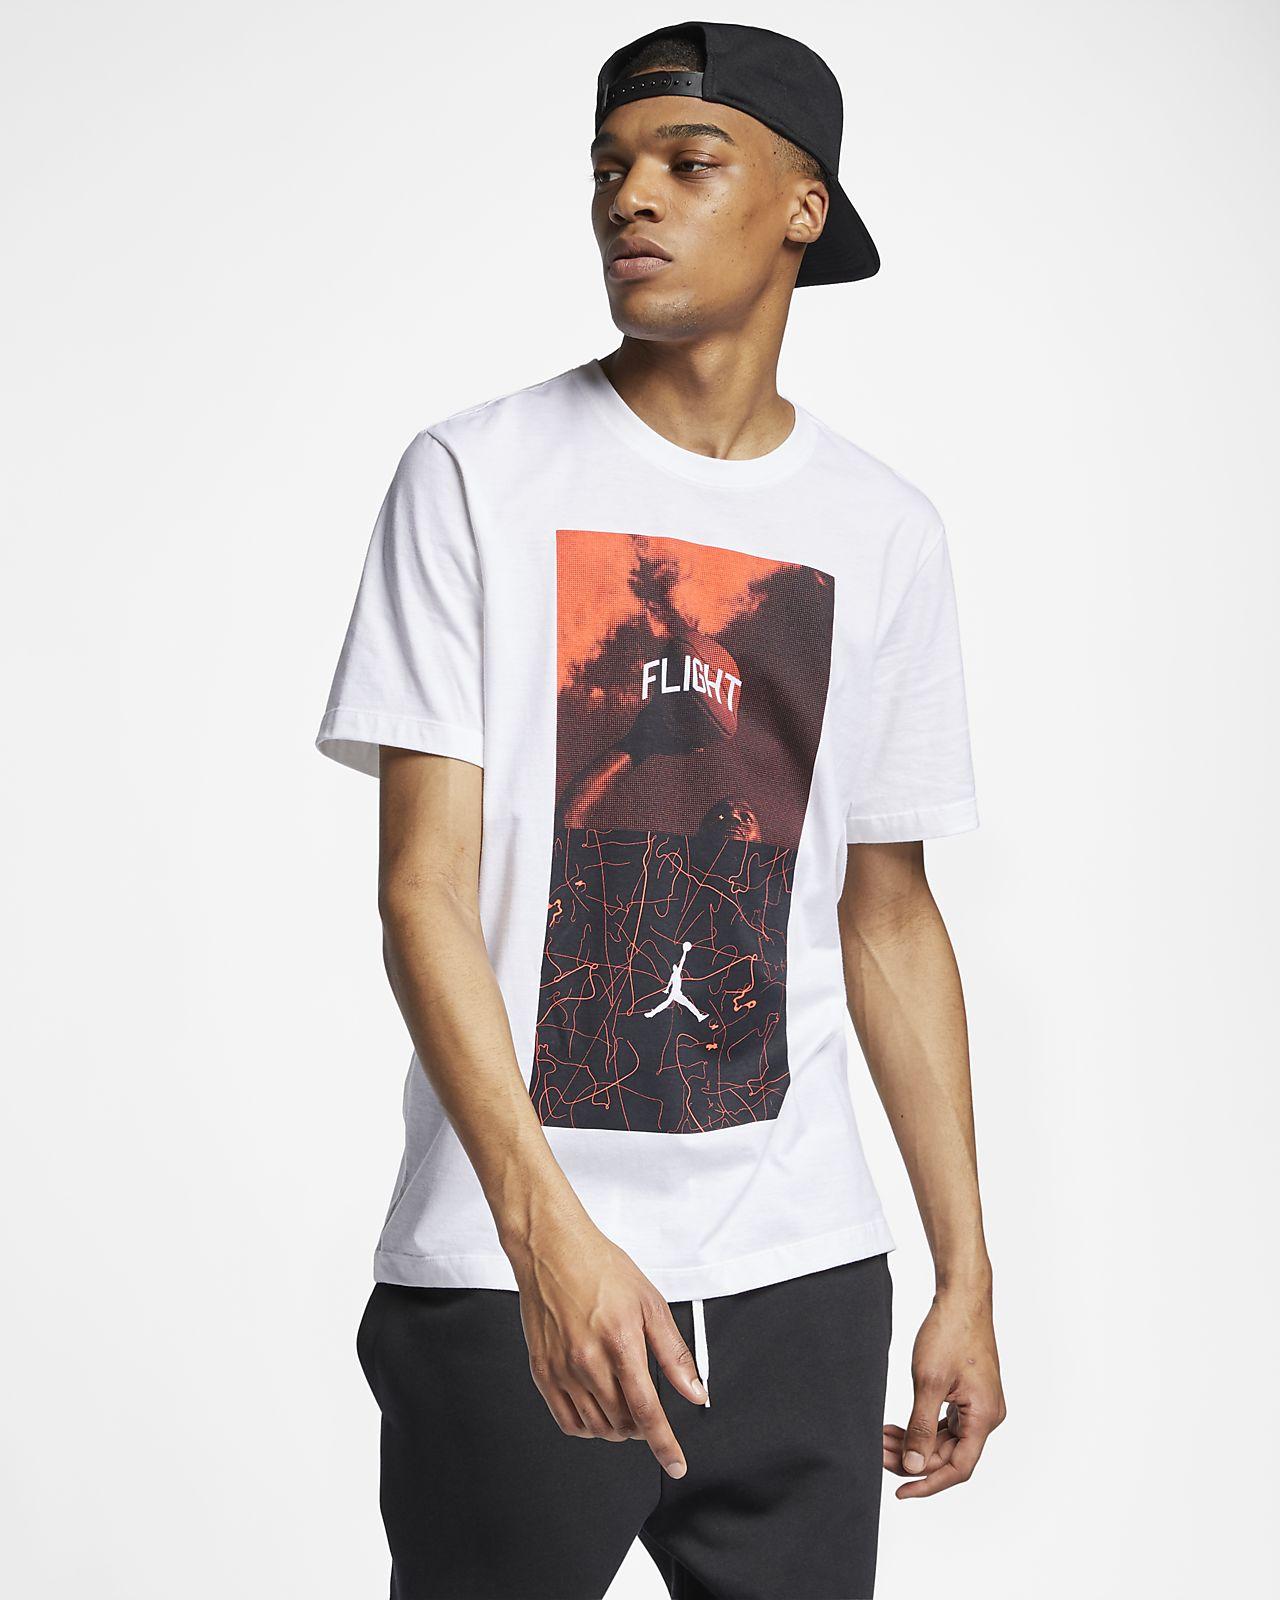 7767a1377720 Jordan Legacy Flight Nostalgia AJ 4 Men s T-Shirt. Nike.com MY